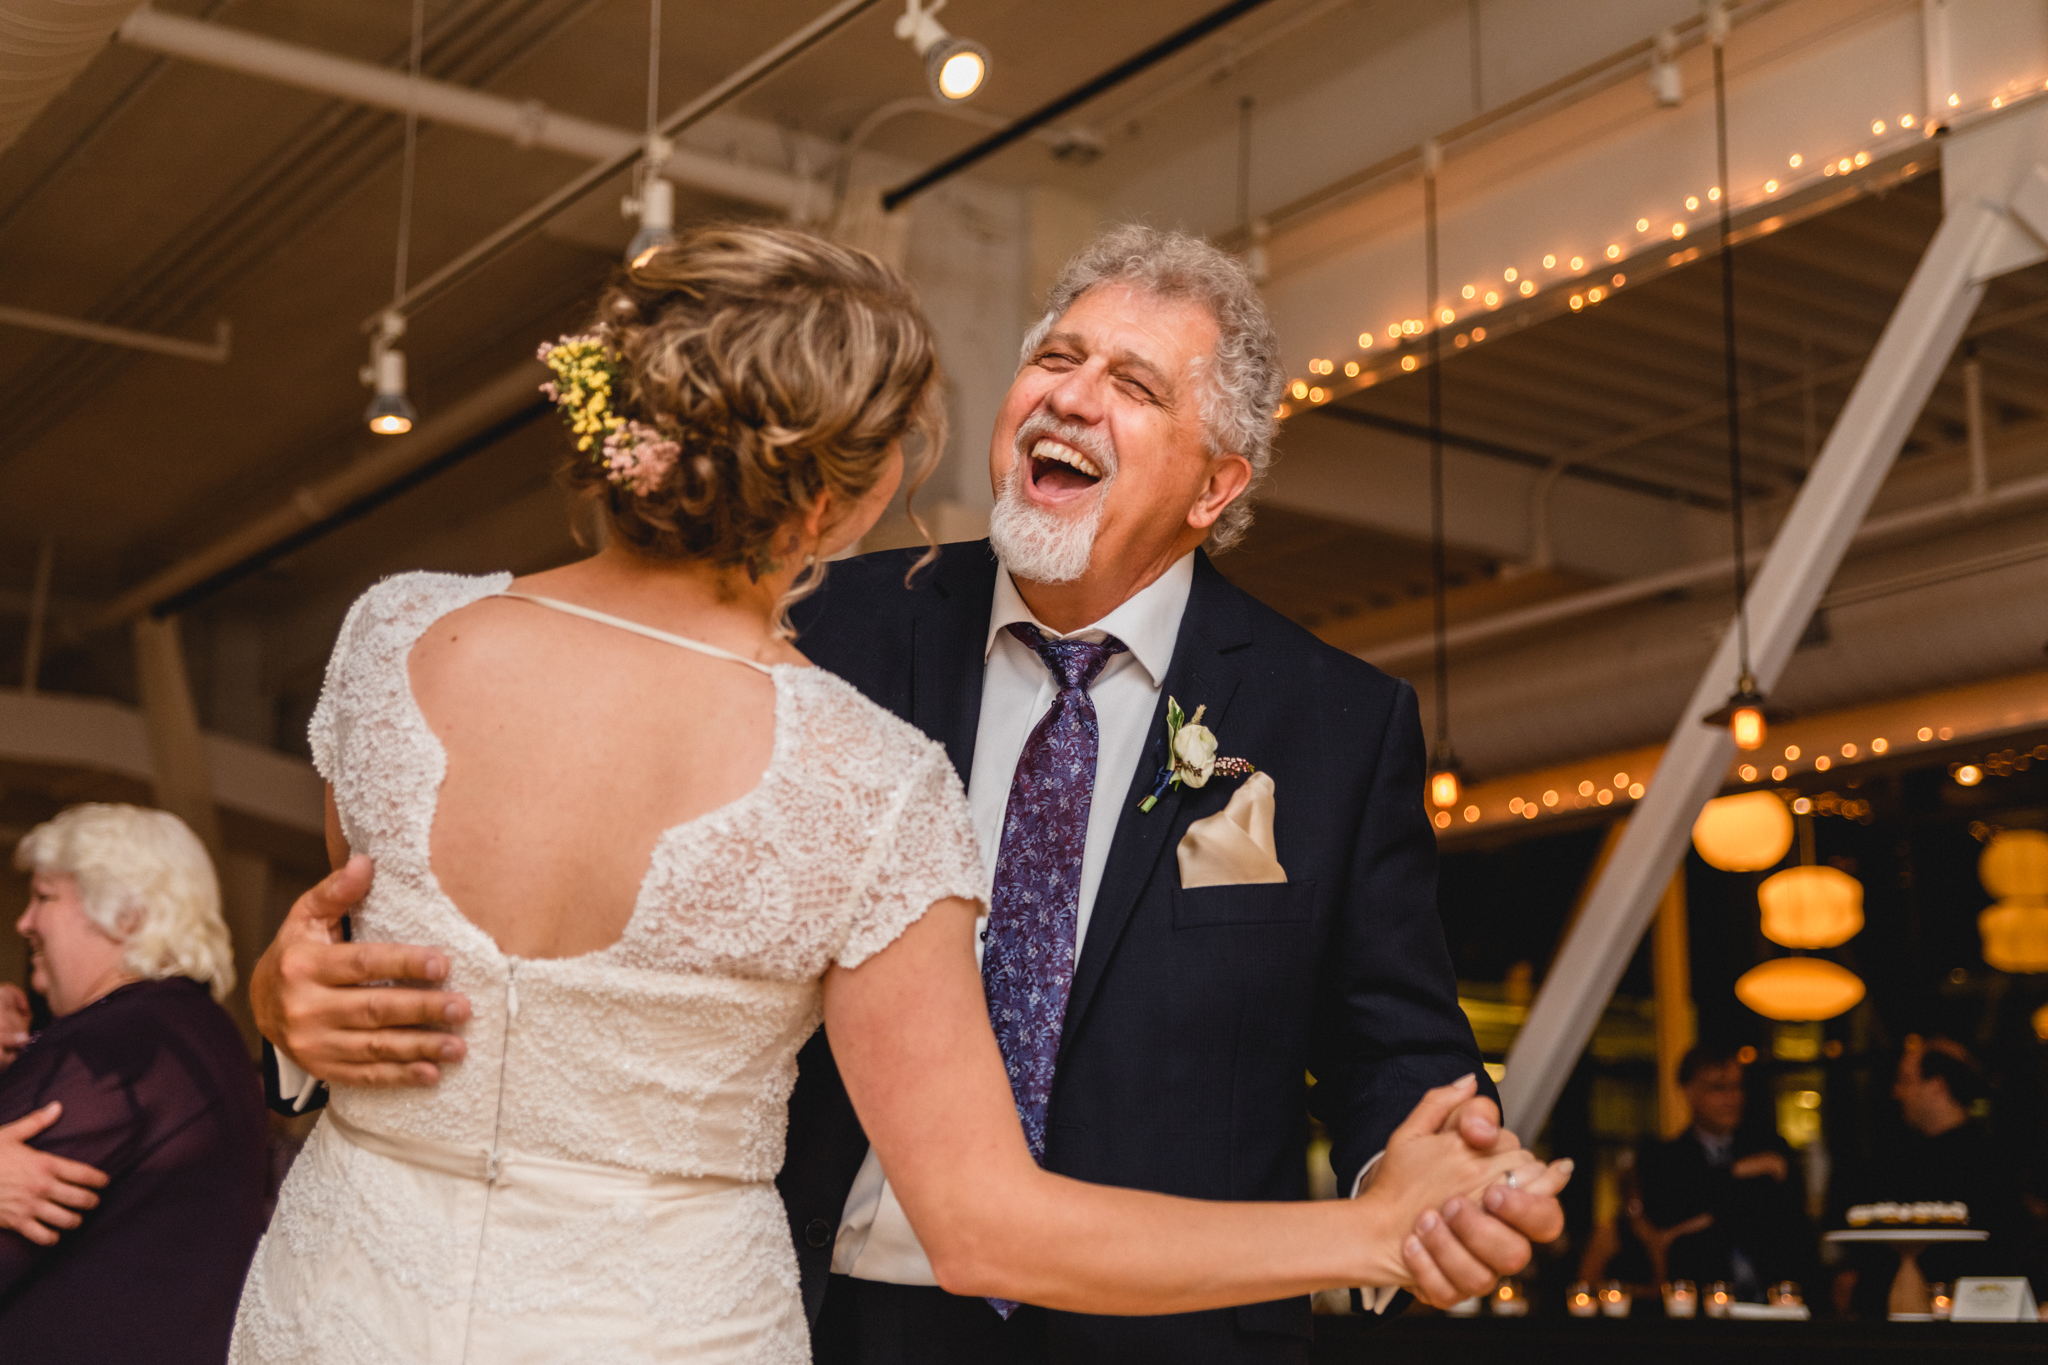 chicago-greenhouse-loft-father-daughter-wedding-dance-rebeccaylasotras.jpg